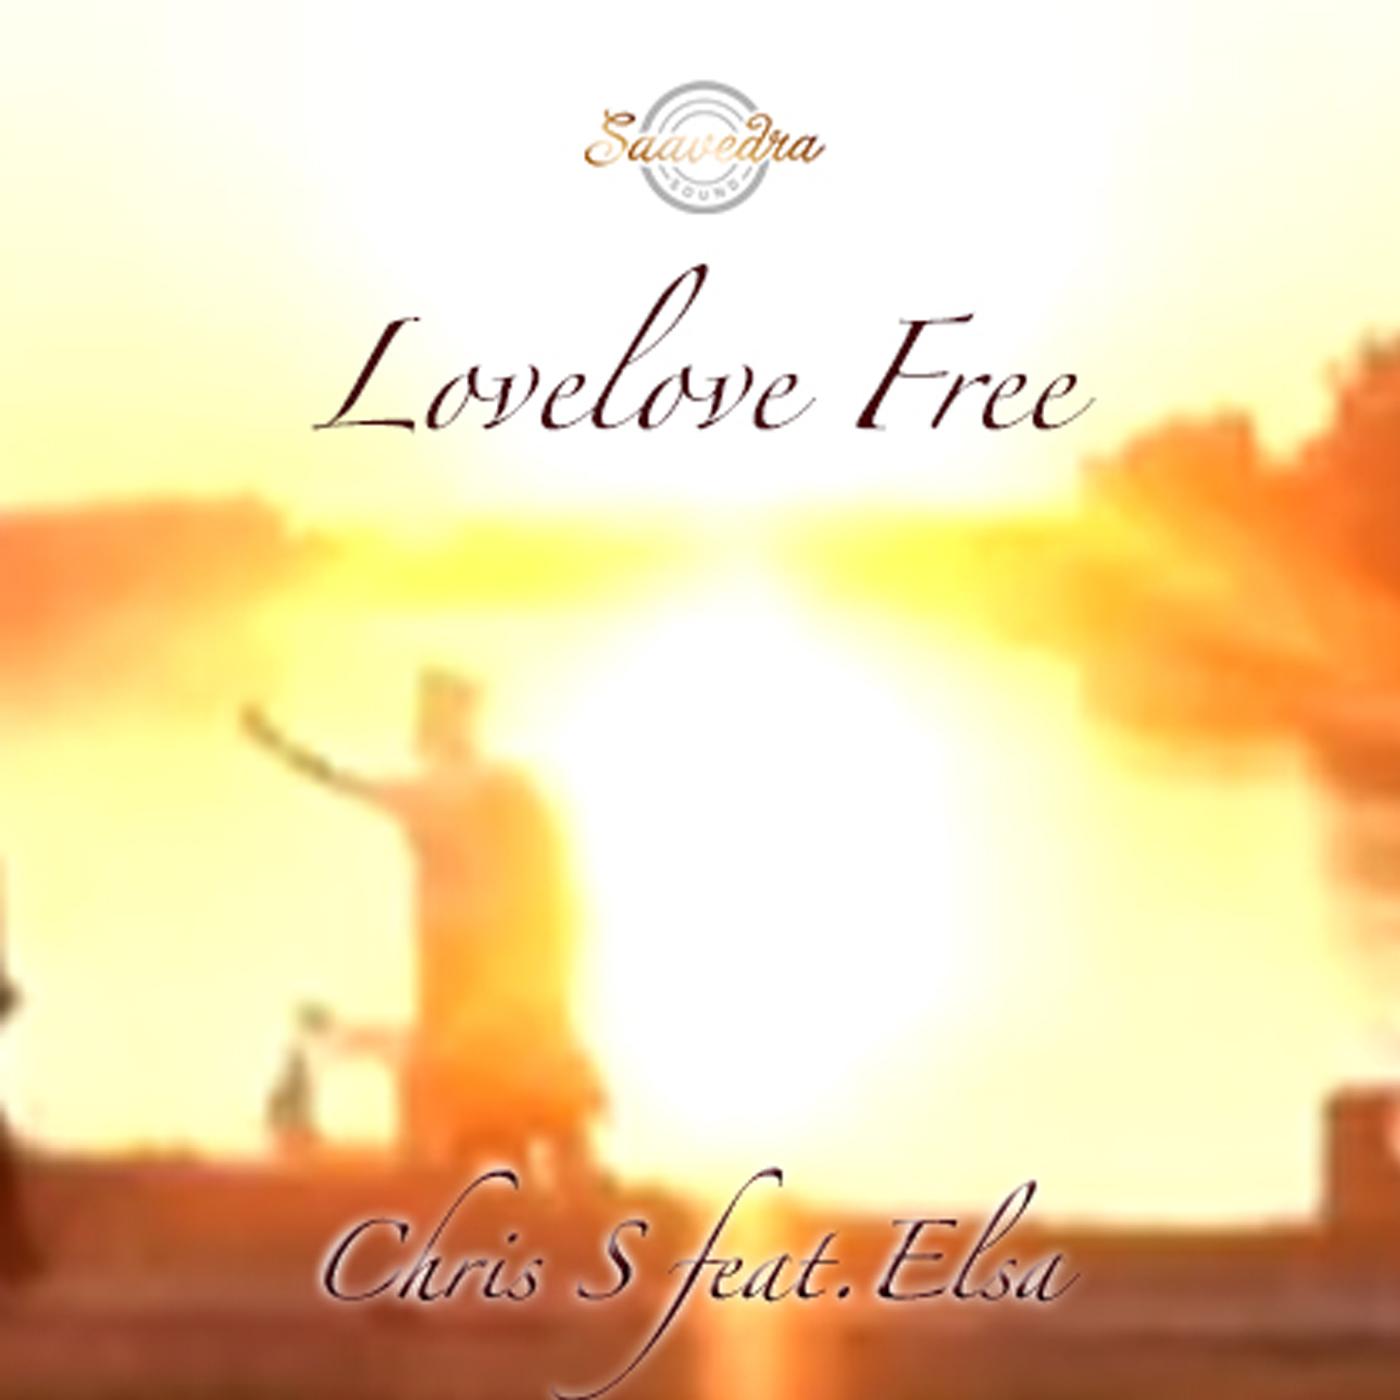 Lovelove free - Chris S feat Elsa .jpg